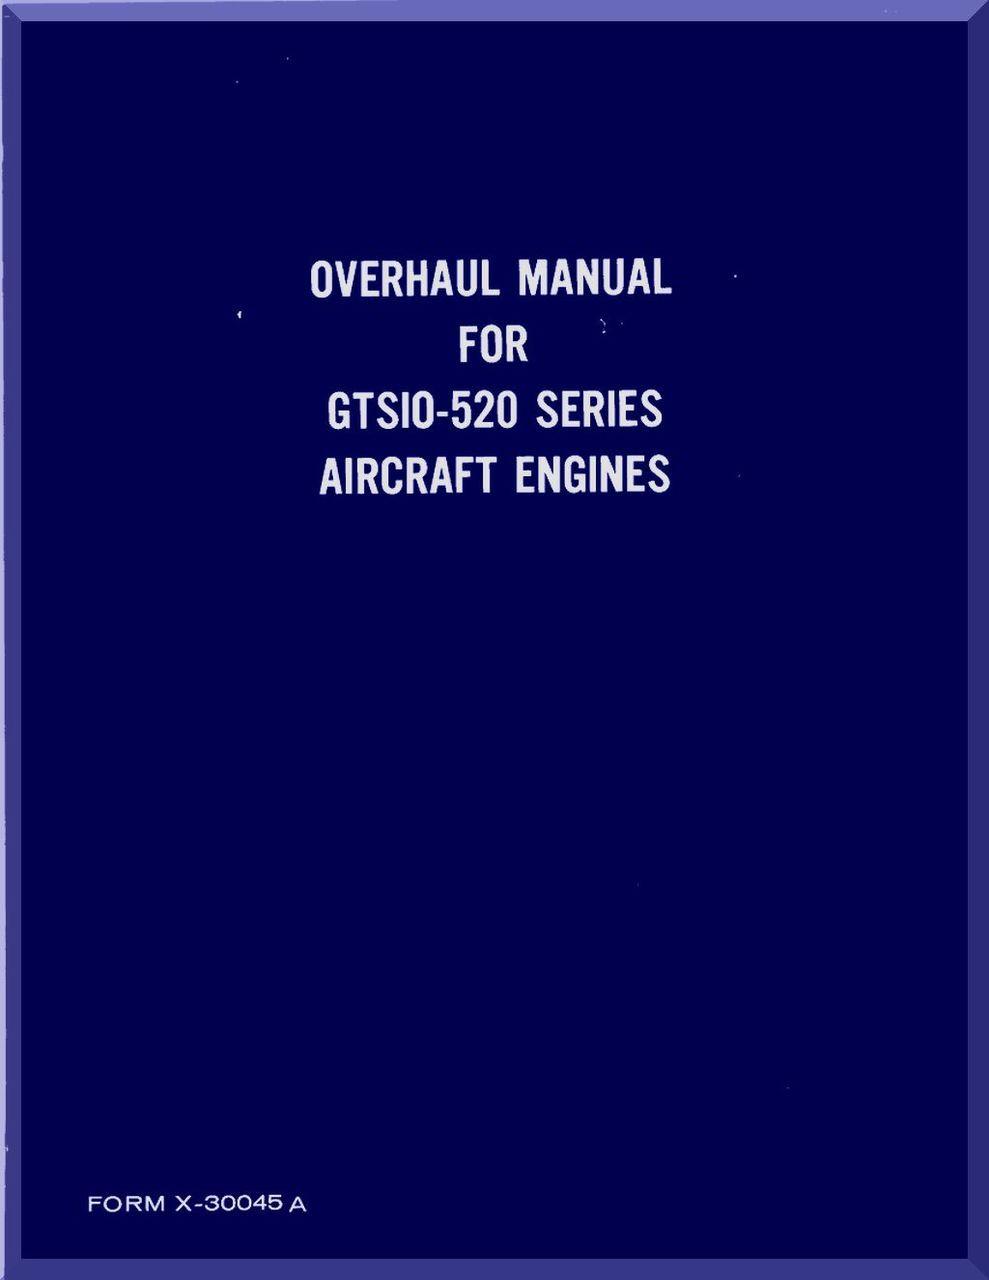 continental gtsio 520 aircraft engine overhaul manual english rh aircraft reports com gtsio-520 series engine overhaul manual tsio 520 service manual